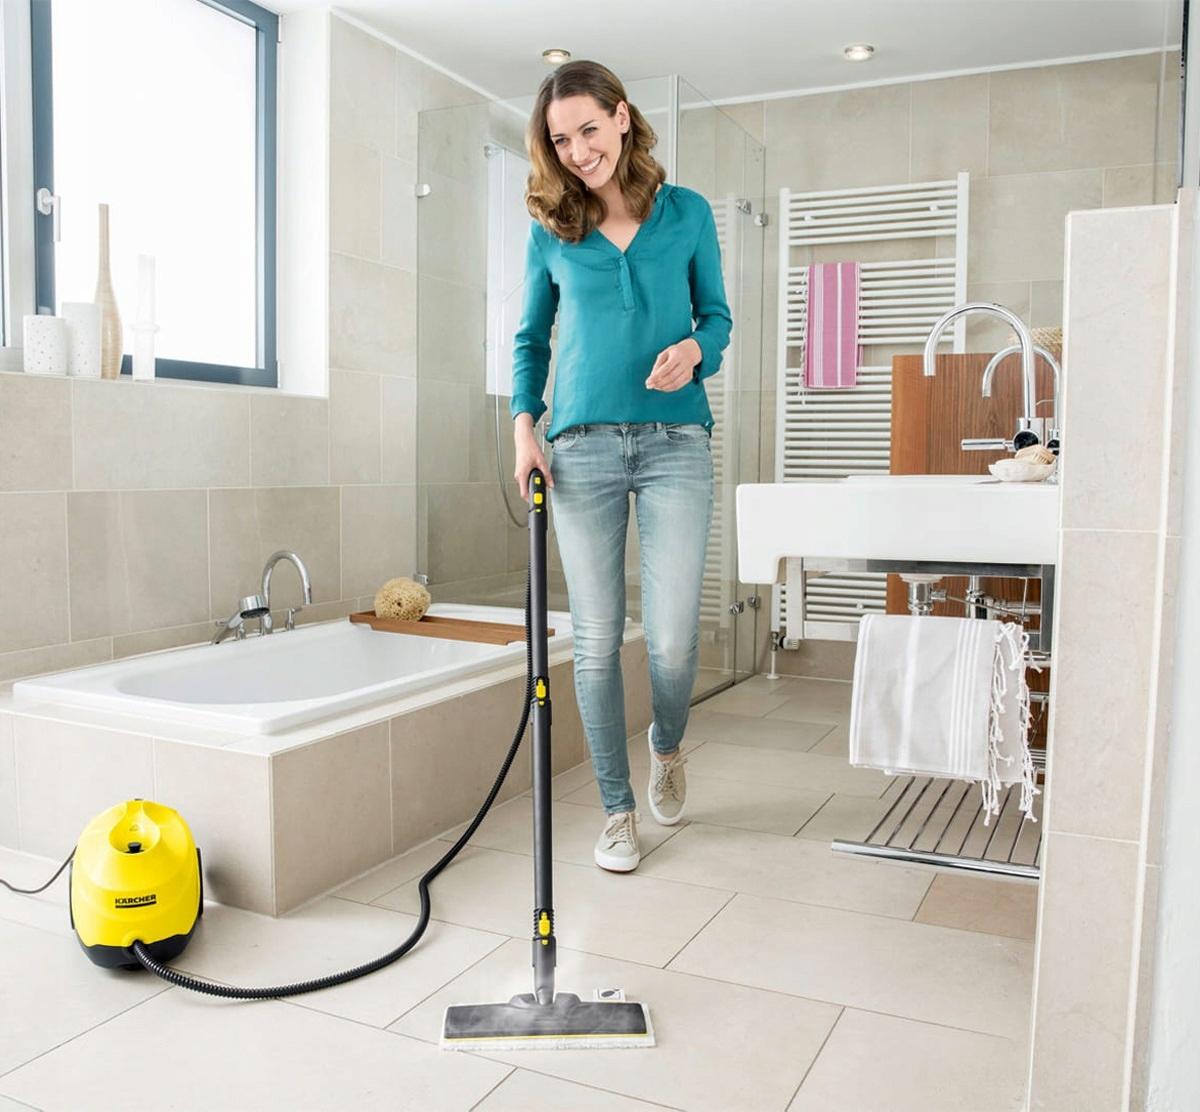 Karcher shower cleaner 650 gsm tarpaulin